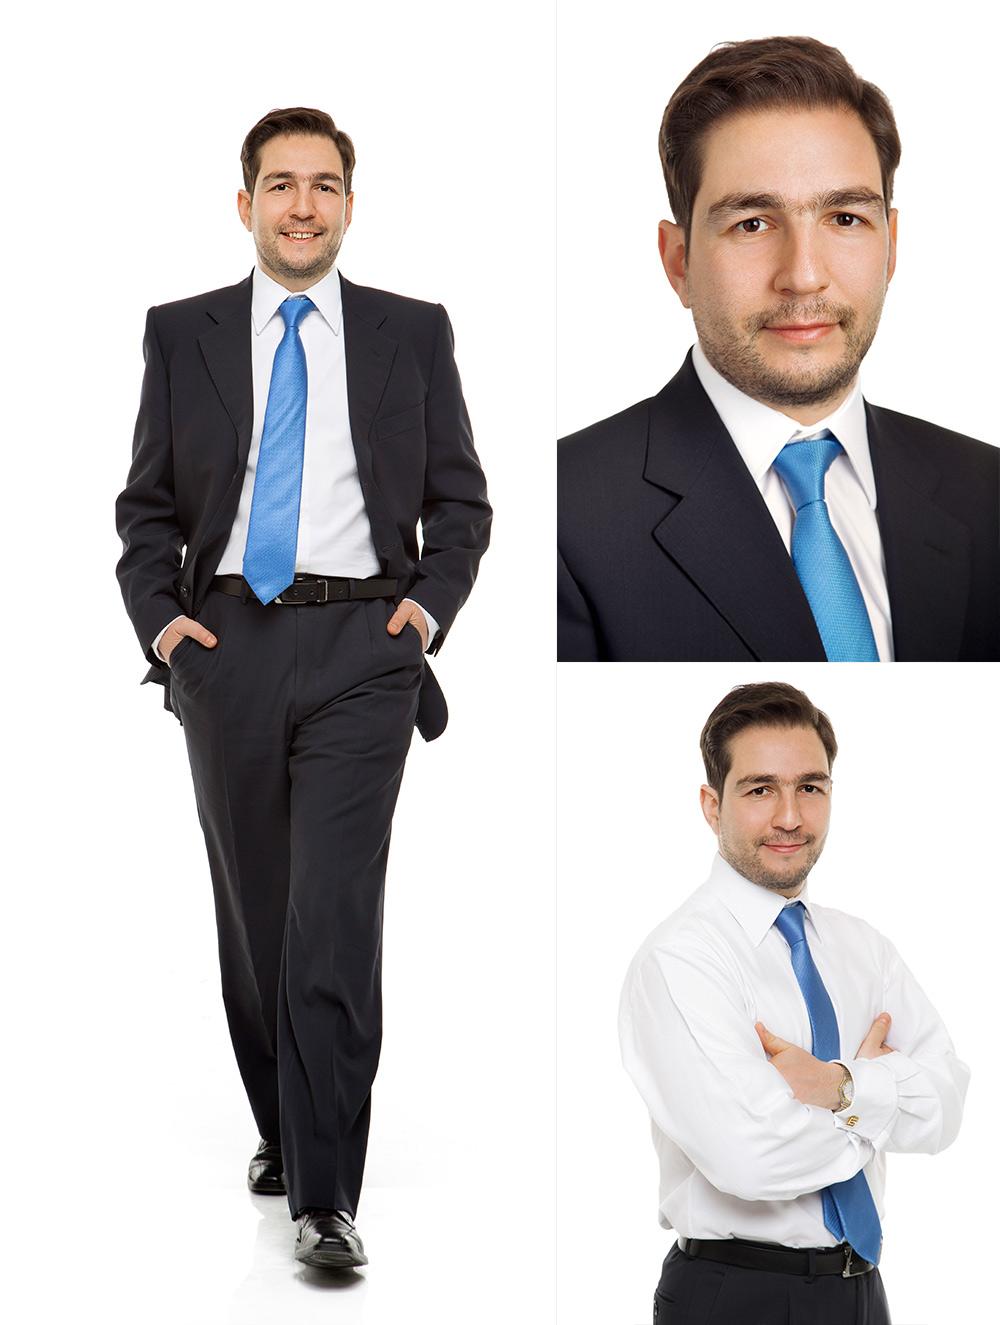 LV5_6375-collage.v2. Бизнес-портрет, фотограф Лена Волкова